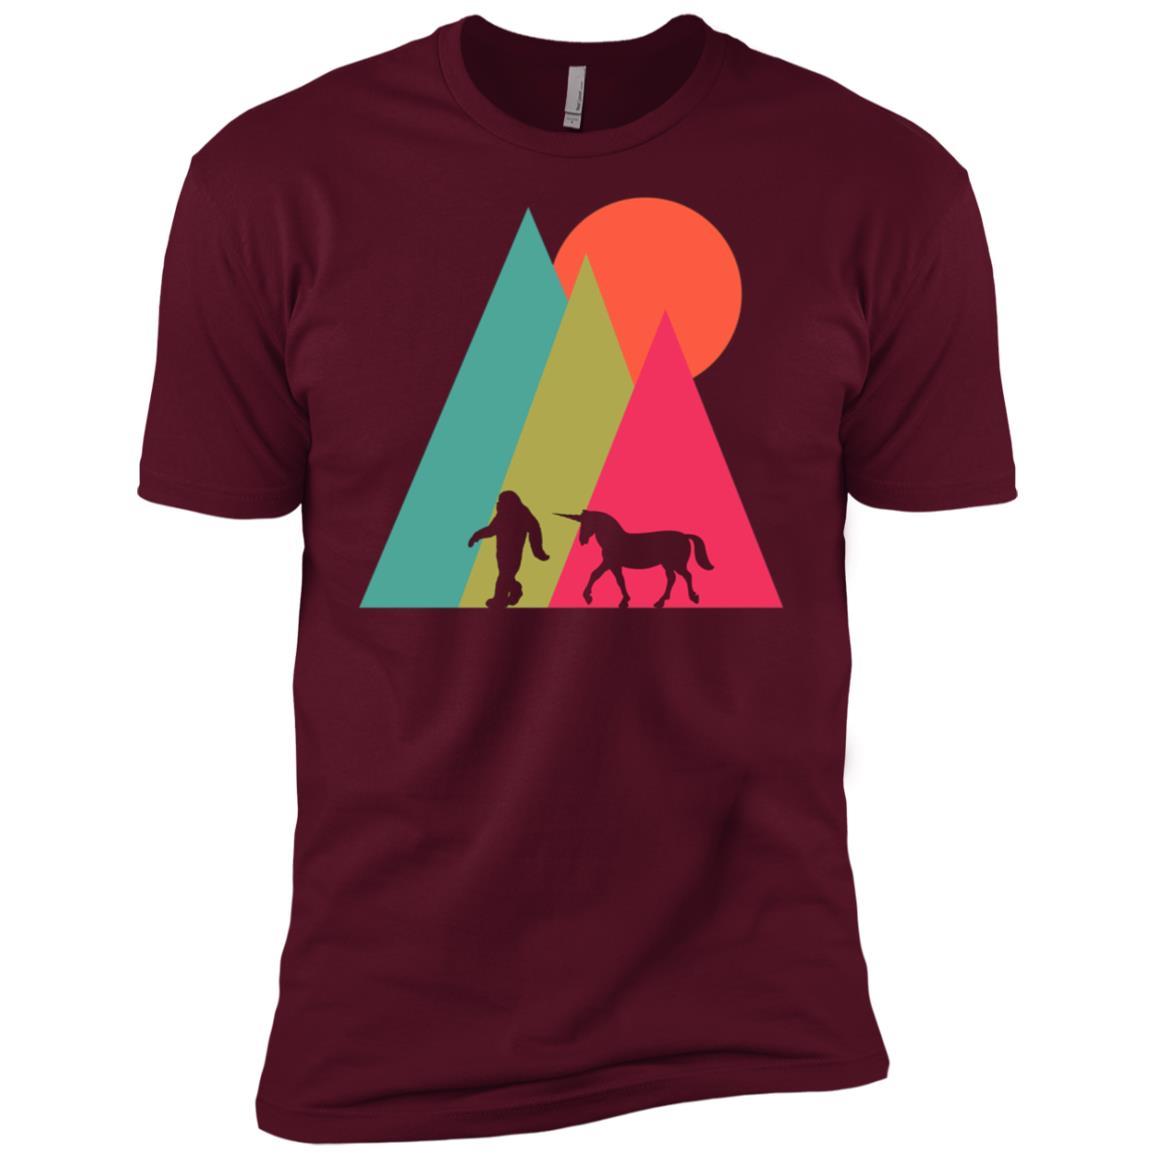 Unicorn Bigfoot Graphic Tee Mythical Creatures Men Short Sleeve T-Shirt